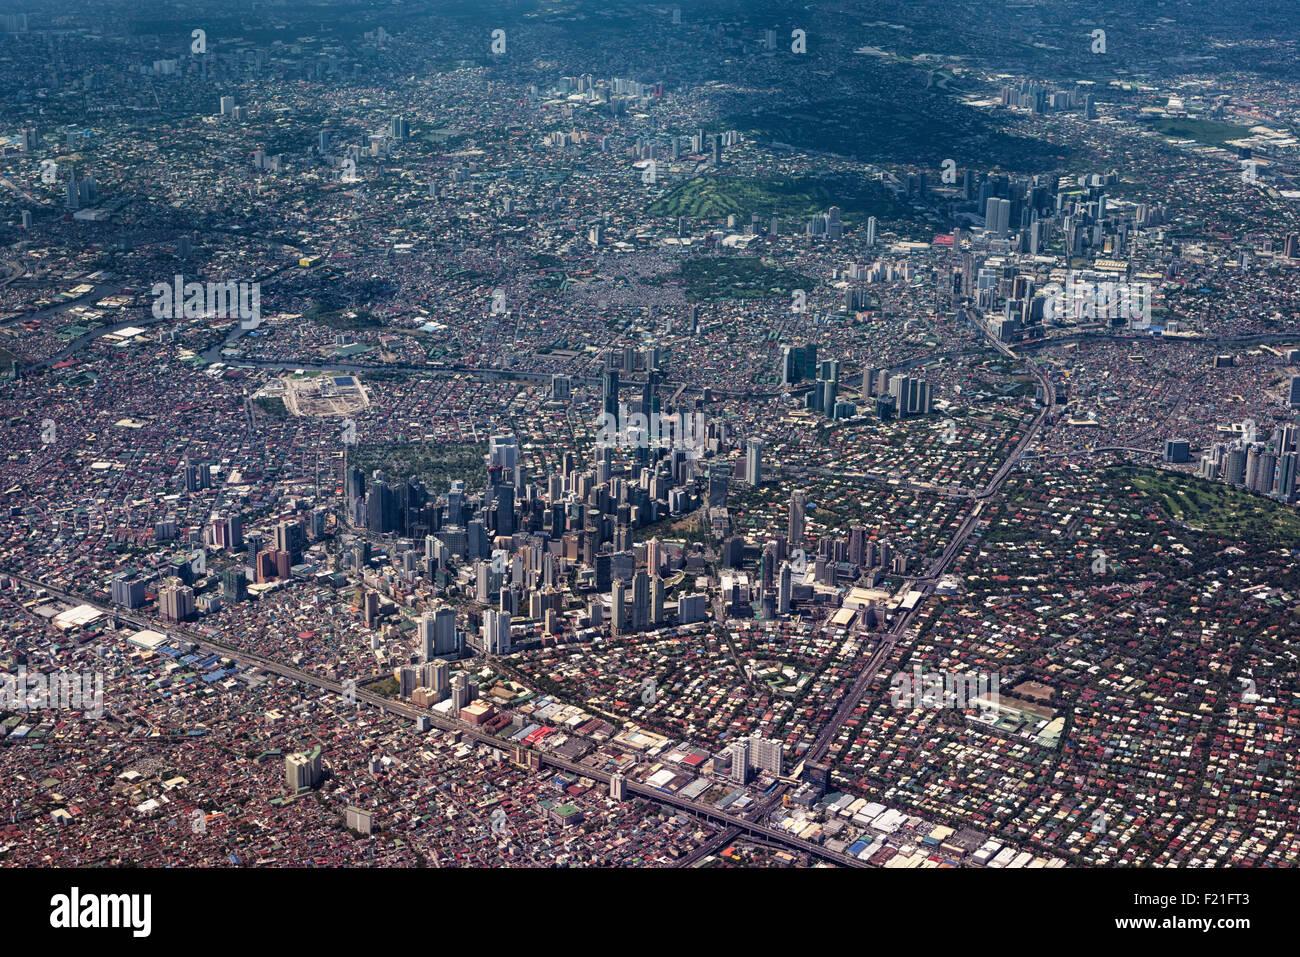 Manila, Philippines -Jun 1, 2015: Metro Manila Aerial View. - Stock Image